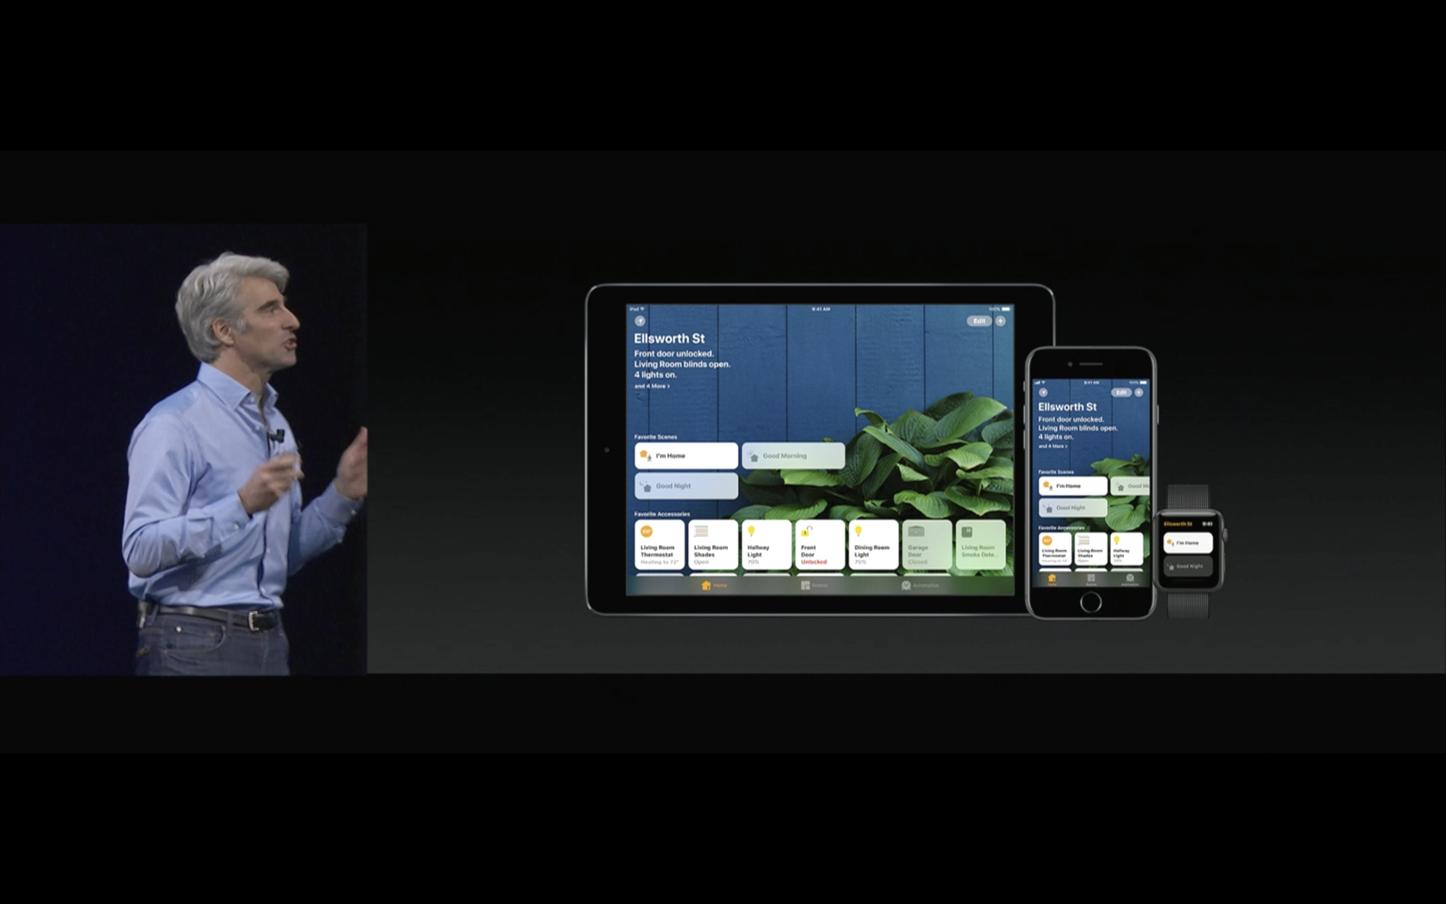 iOS11-2017-WWDC17-53.png